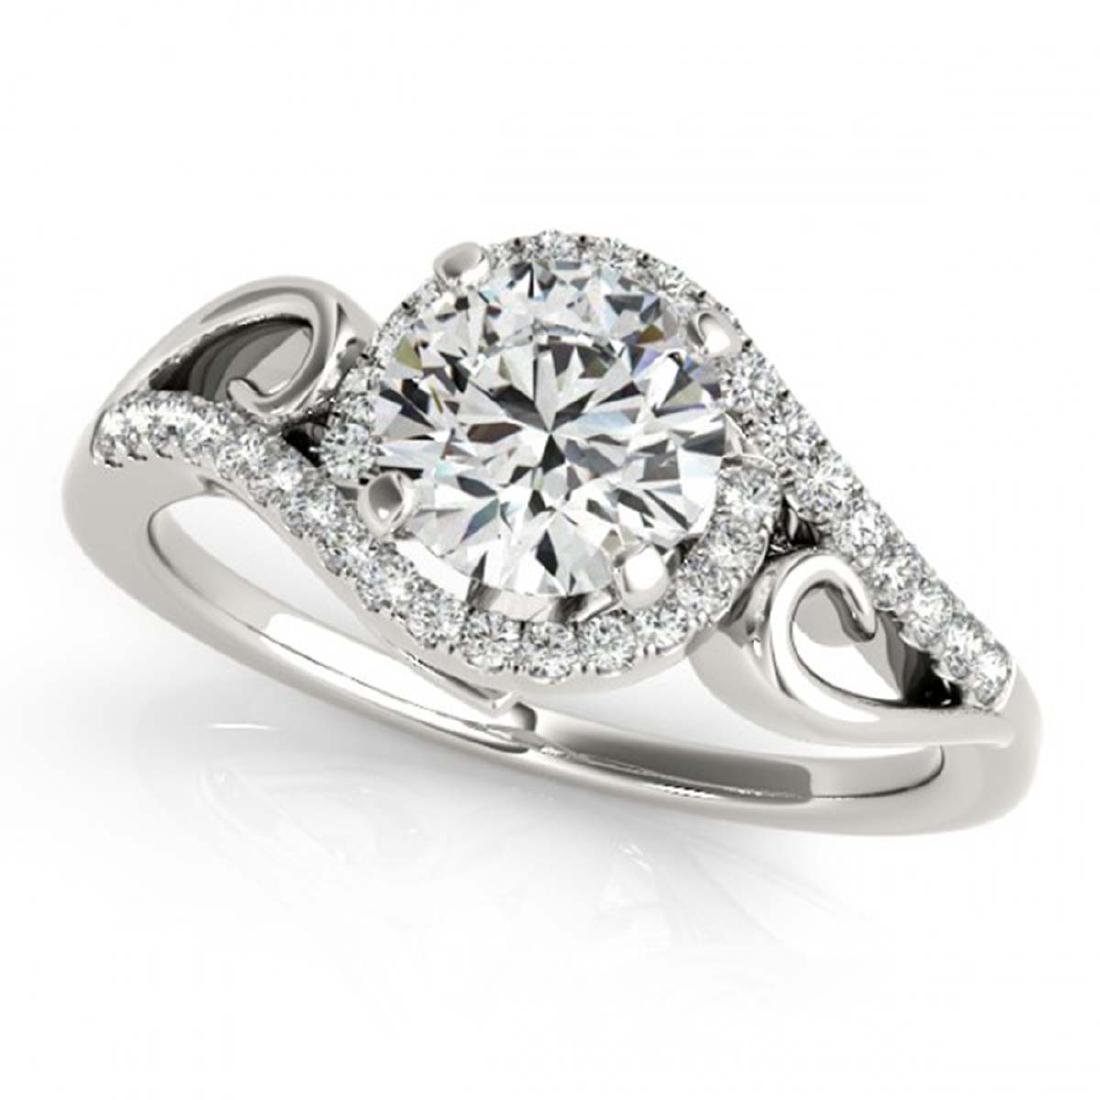 1.25 ctw VS/SI Diamond Solitaire Halo Ring 14K White